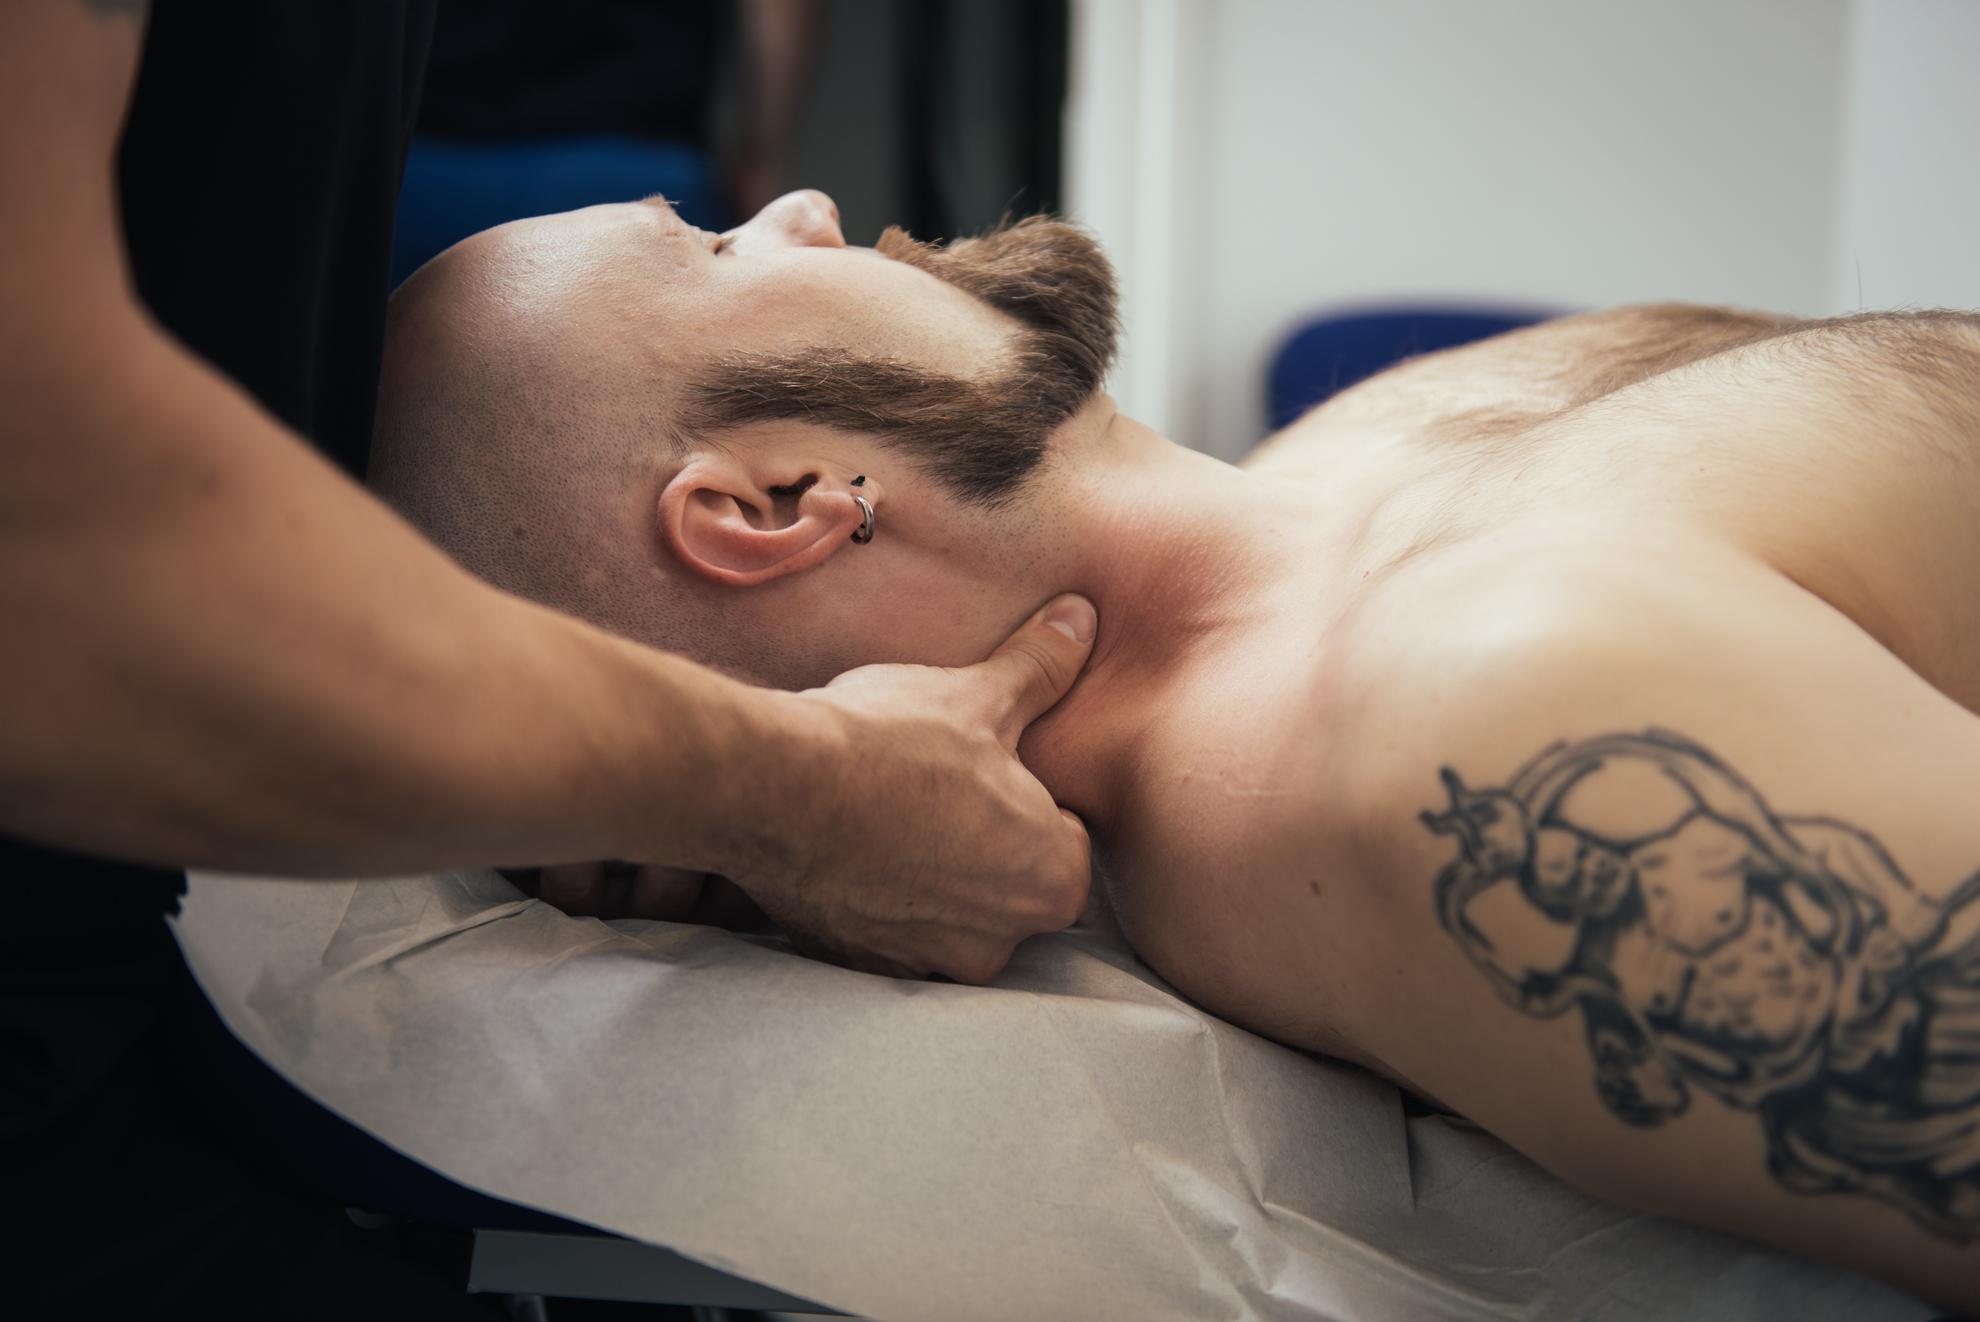 purentalihashieronta Fysioterapia-hieronta-urheiluhieronta-äitiysfysitoerapia